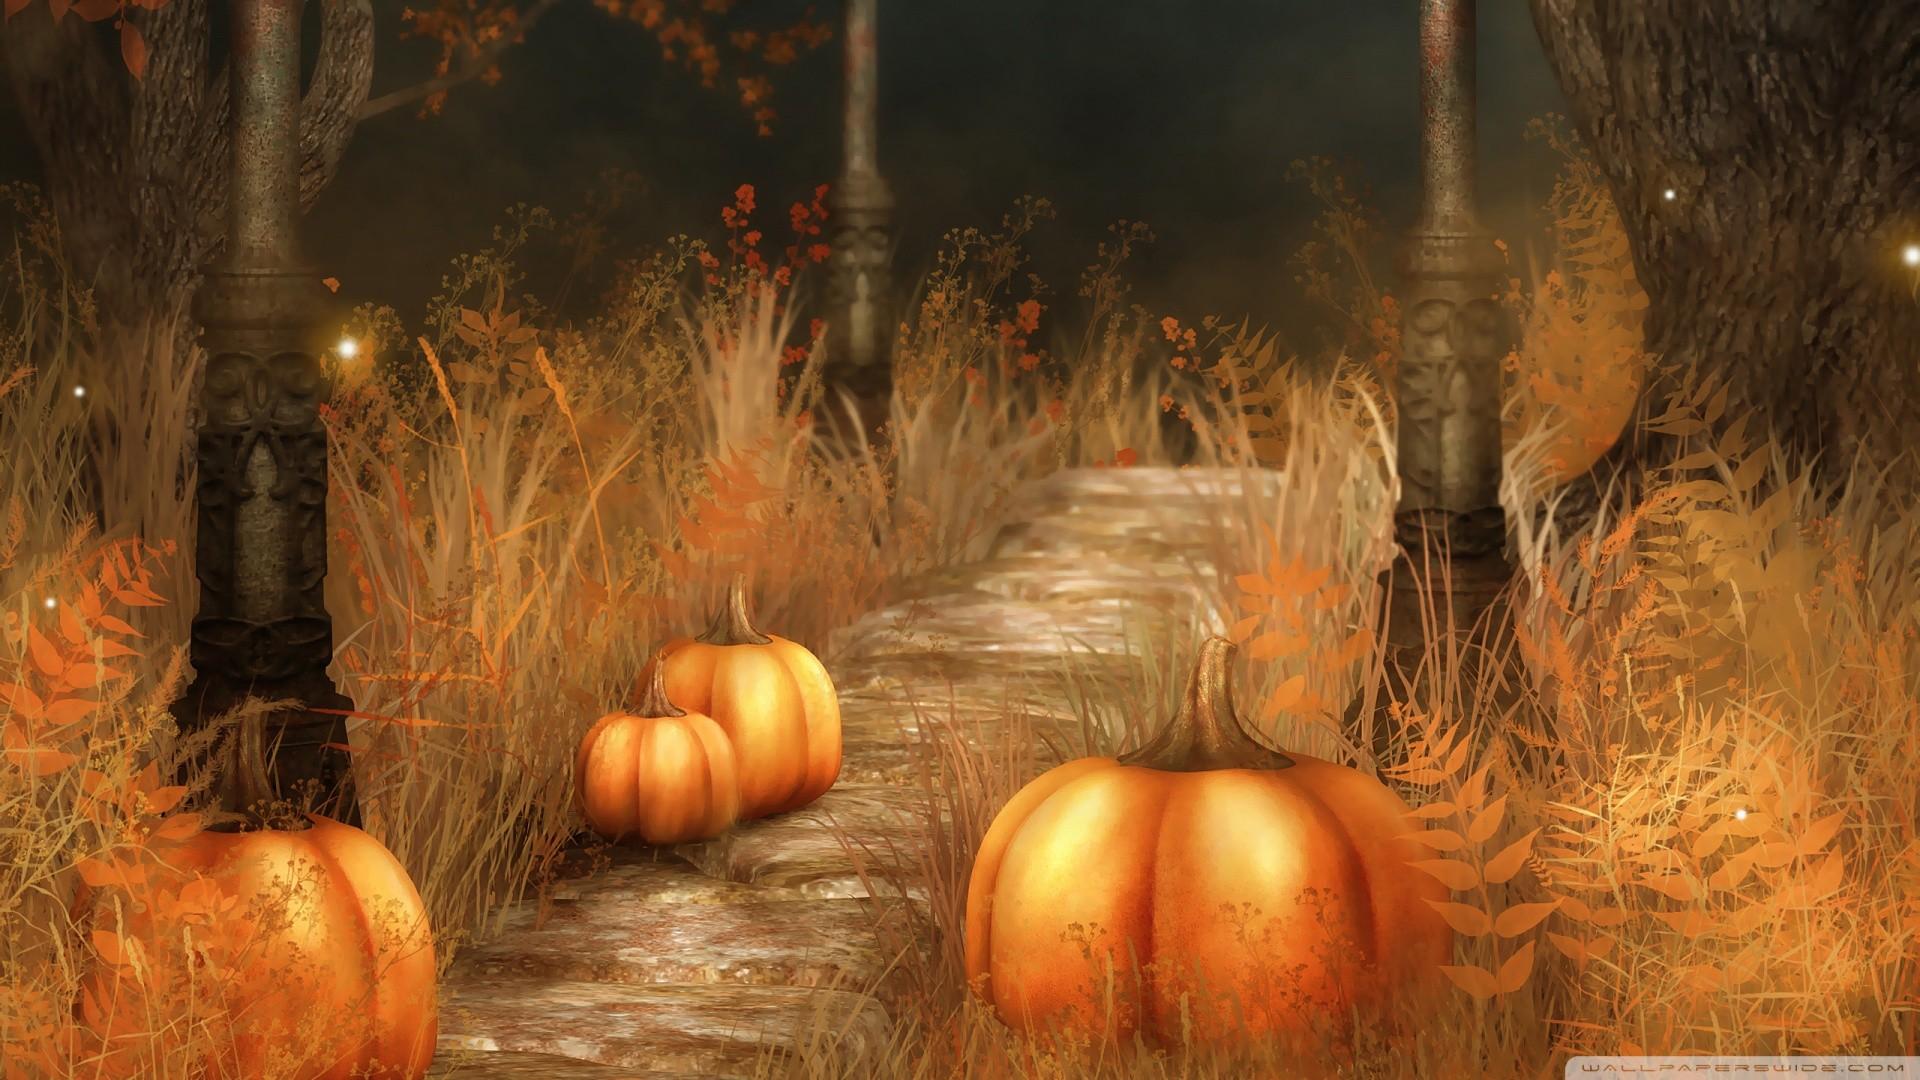 Wallpaper Halloween Pictures (80+ images)